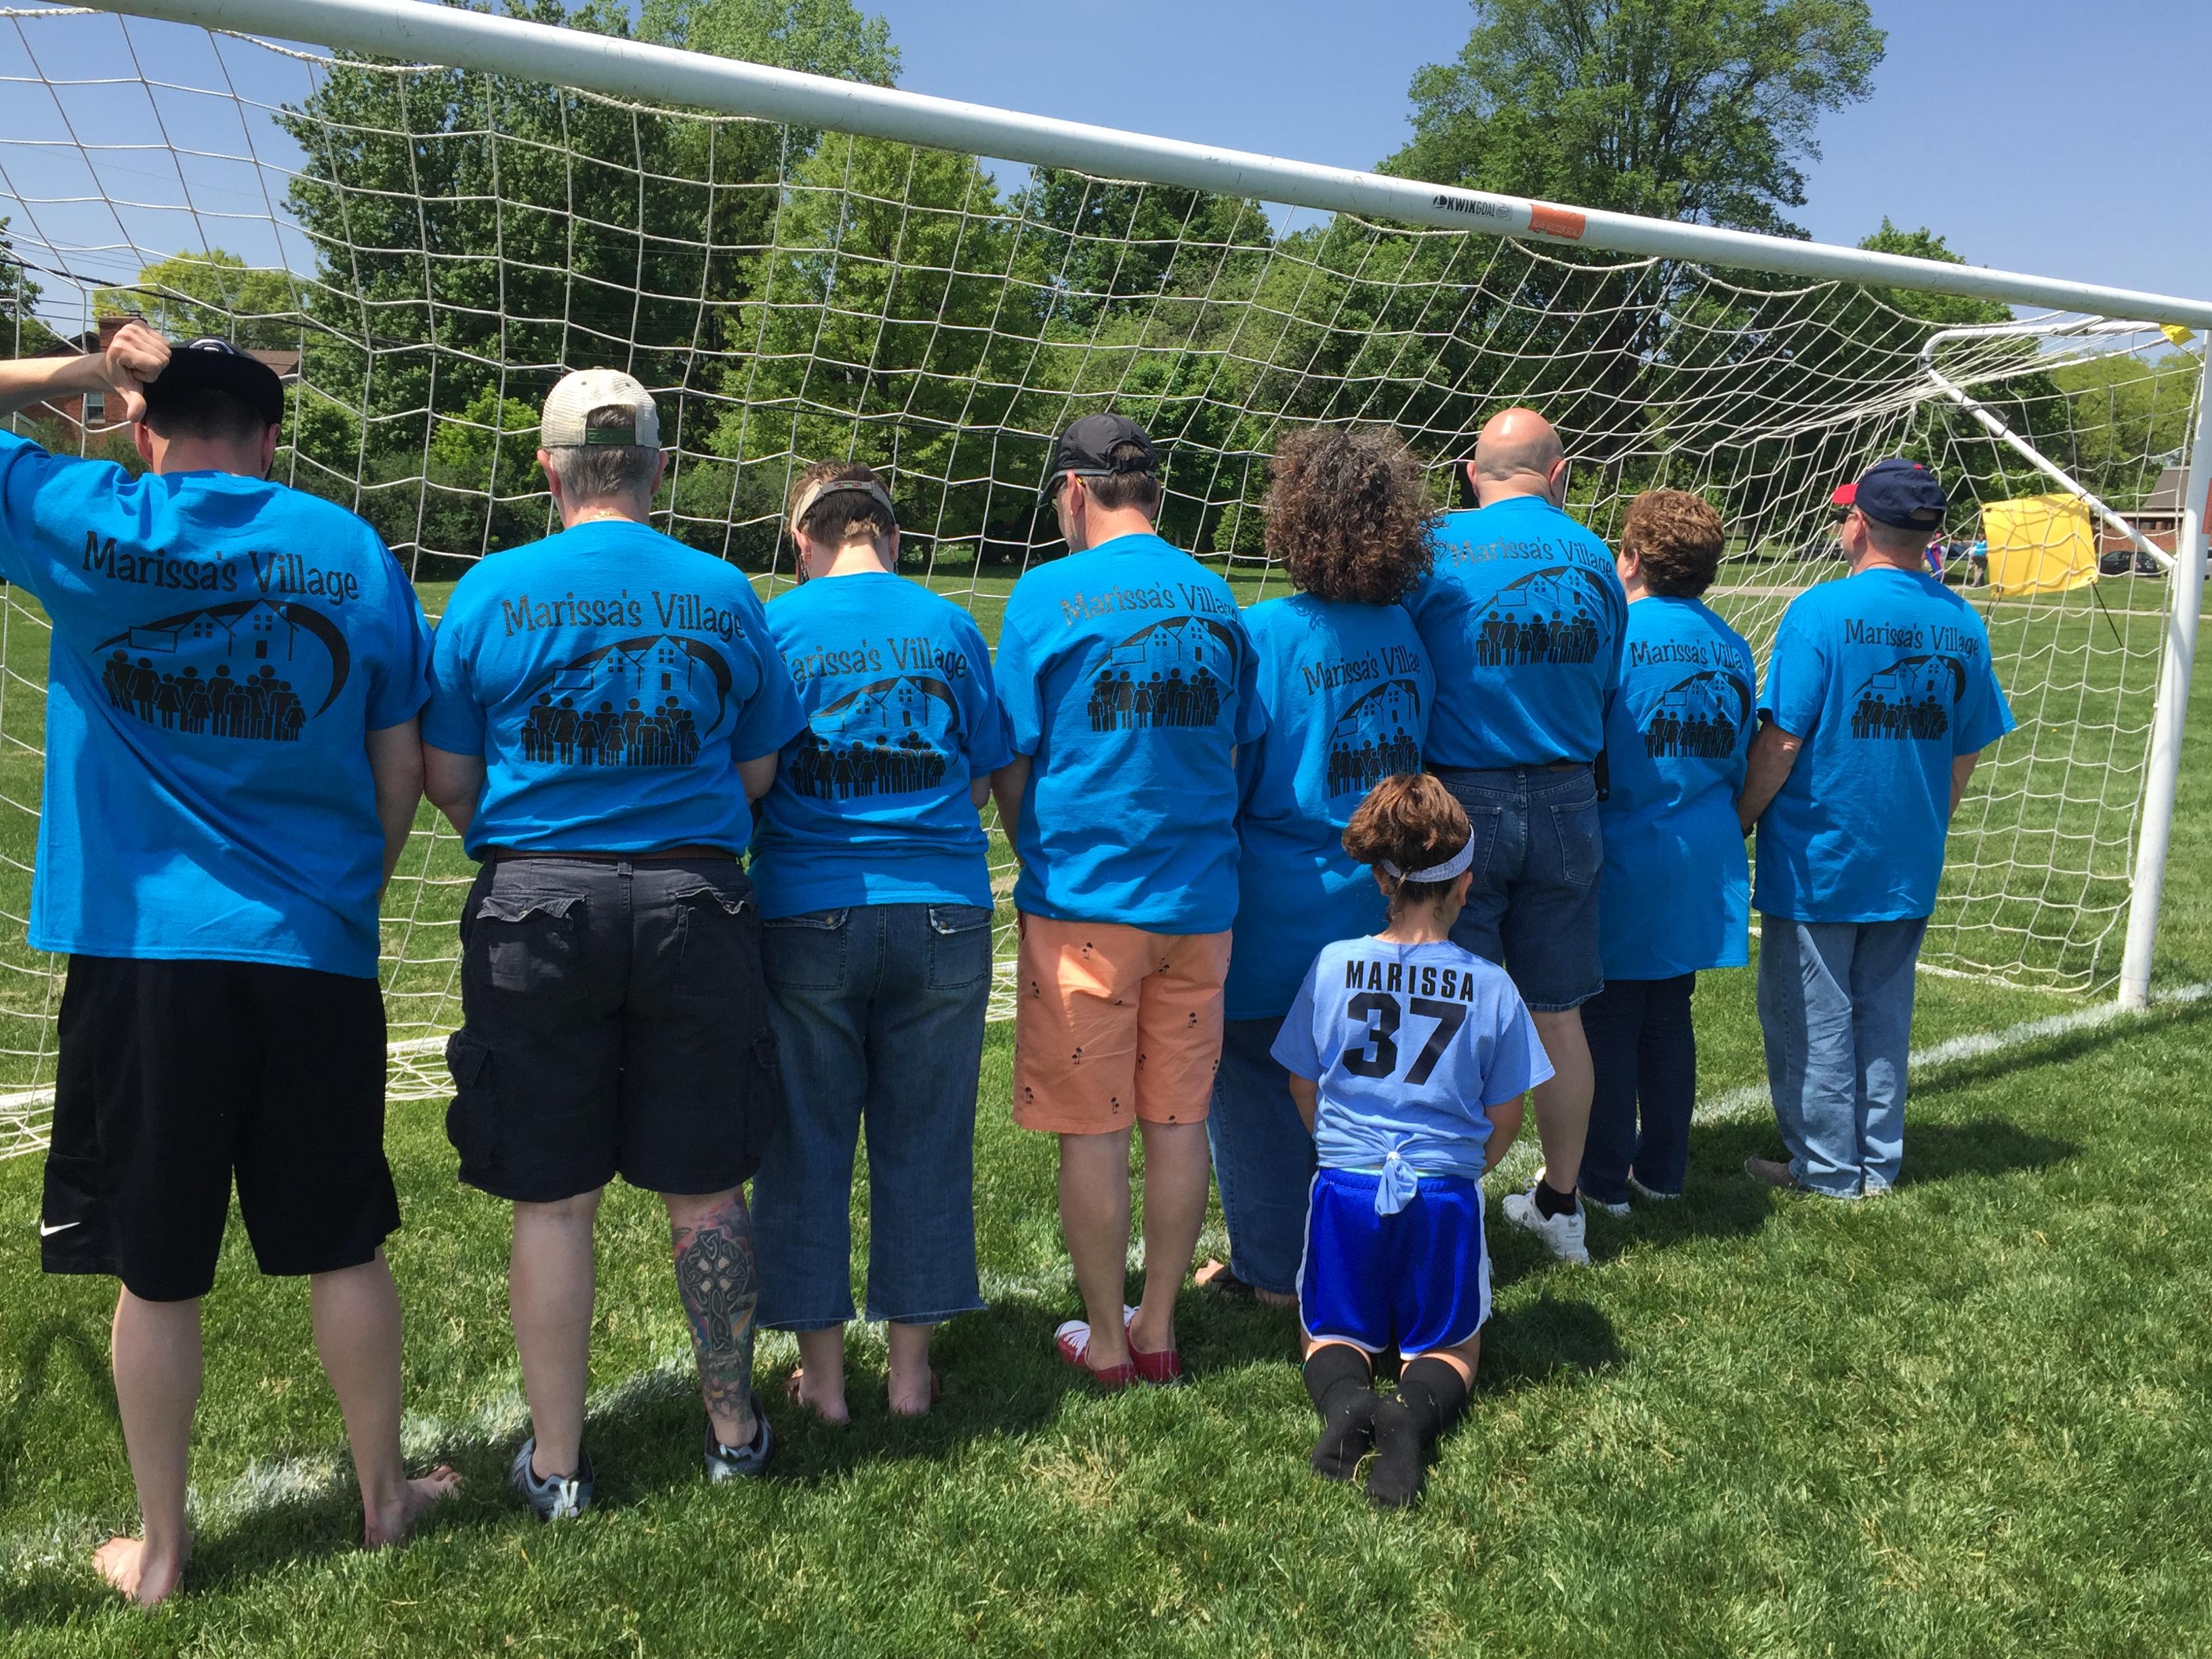 Design your own t shirt columbus ohio - Marissa S Village T Shirt Photo